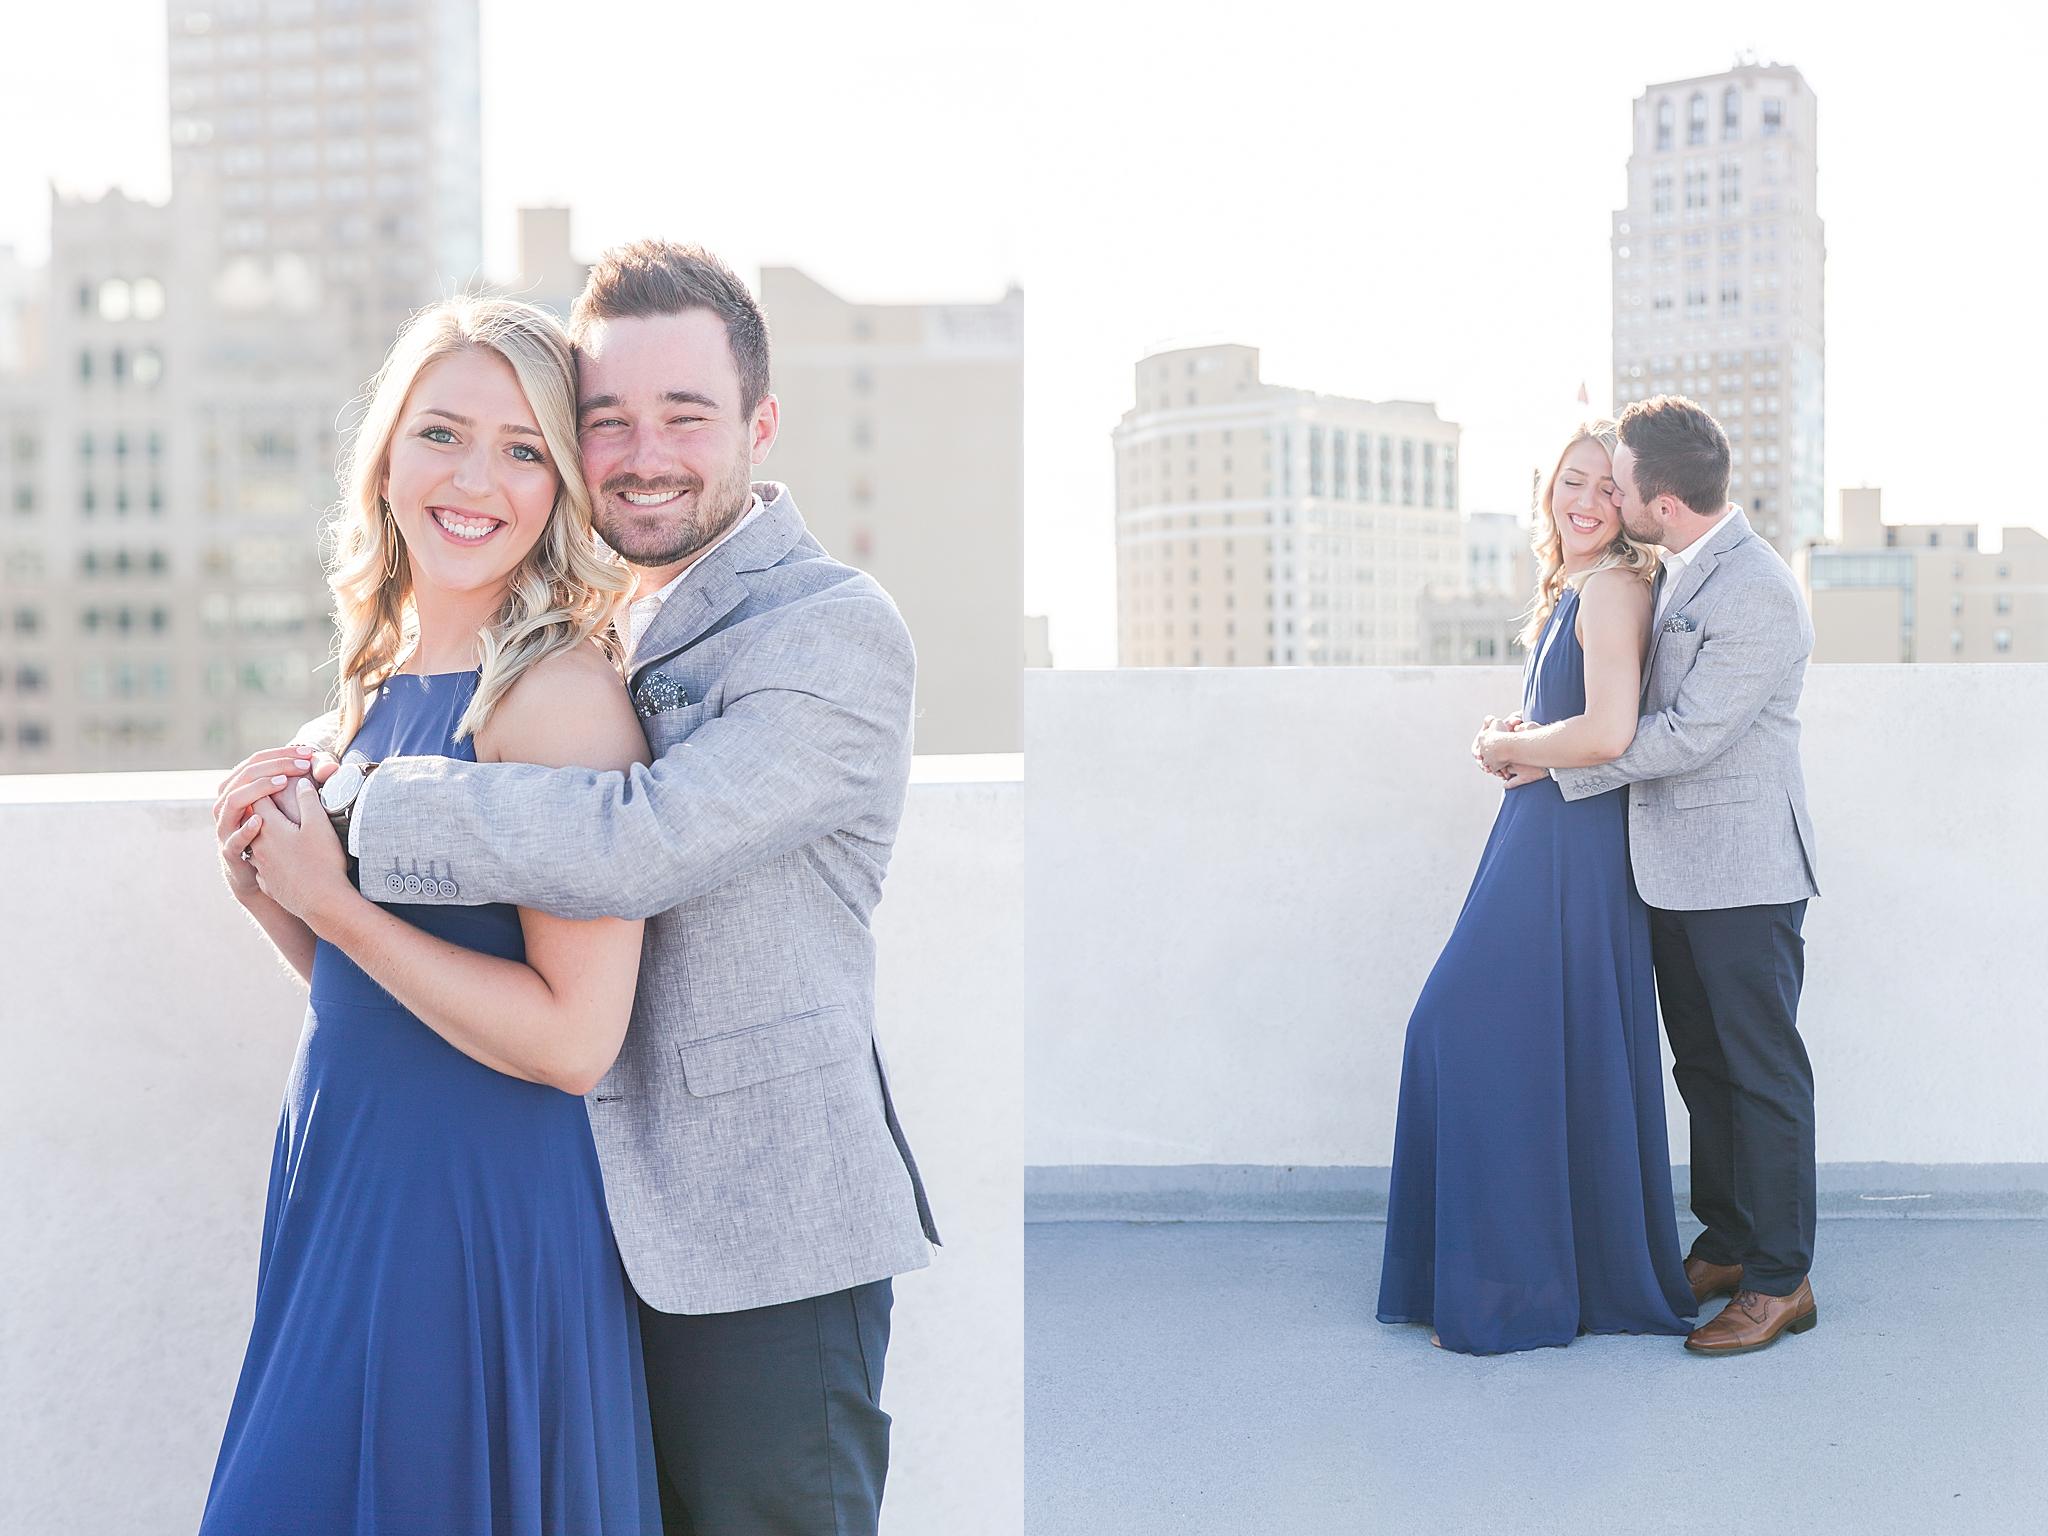 detroit-wedding-photographer-downtown-detroit-belle-isle-engagement-photos-sarah-eric-by-courtney-carolyn-photography_0006.jpg